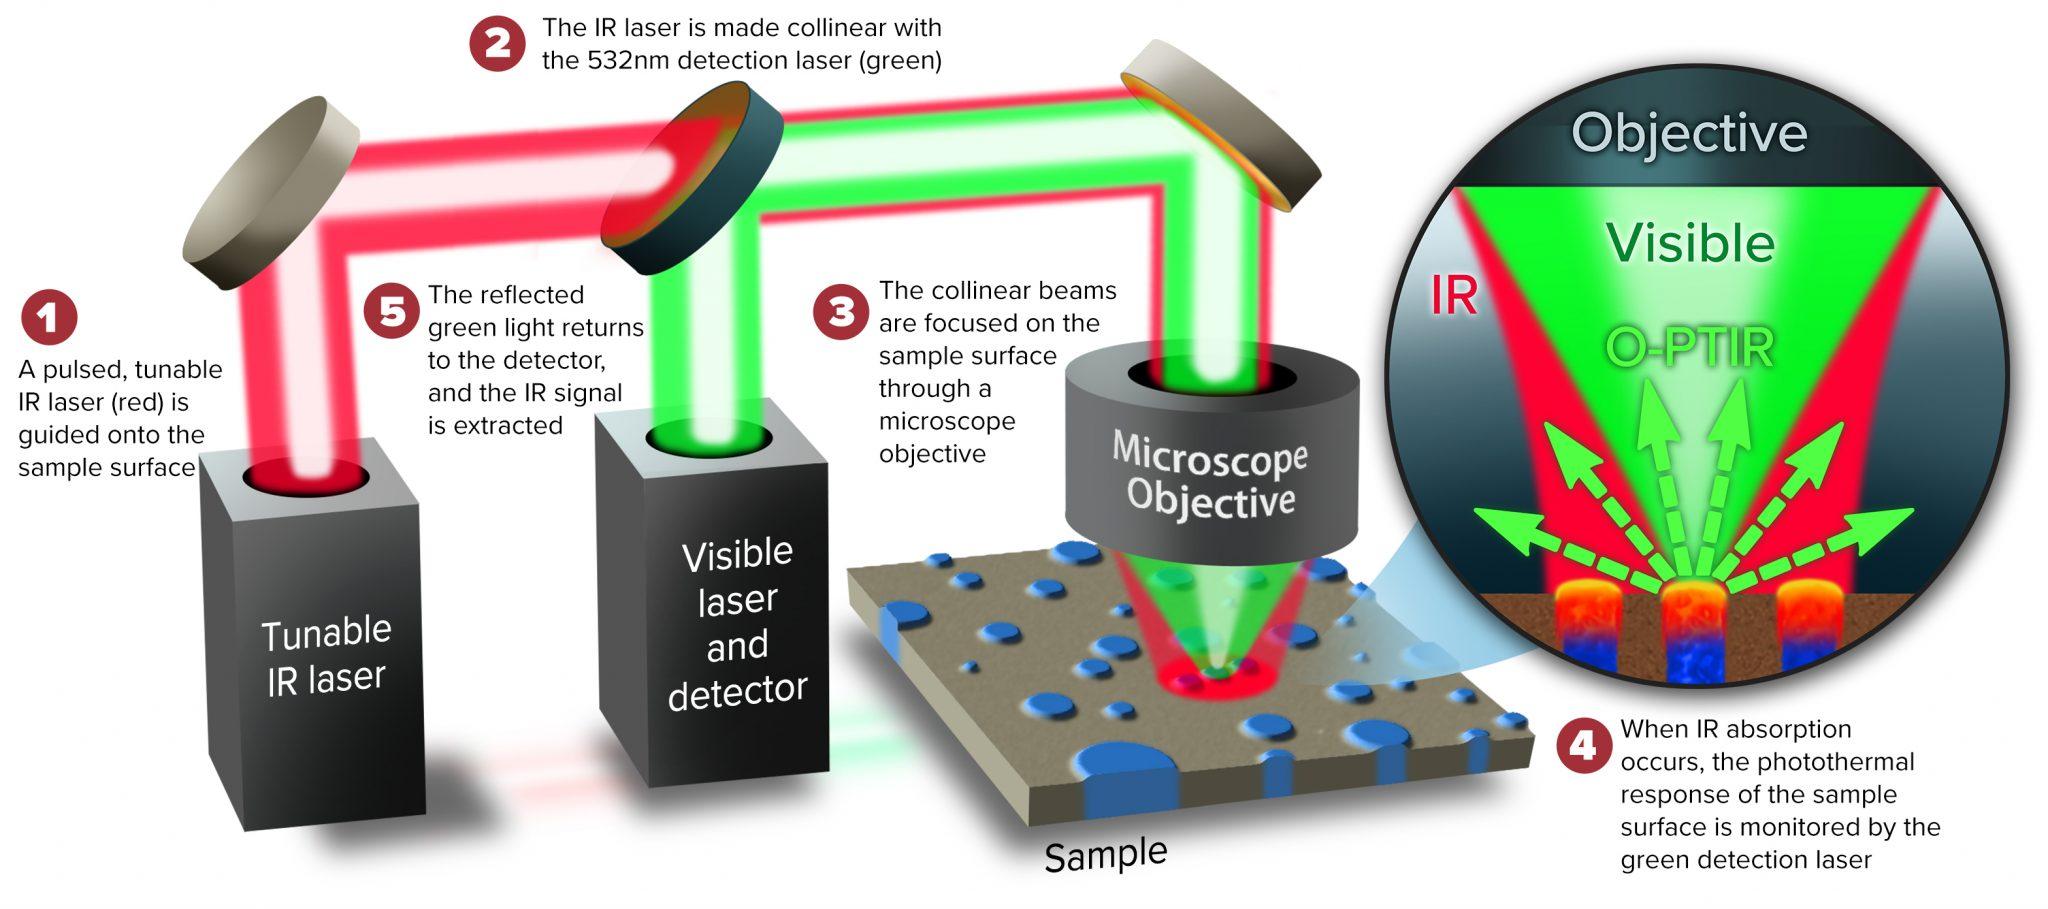 Diagram describing how O-PTIR, Optical PhotoThermal InfraRed spectroscopy works.